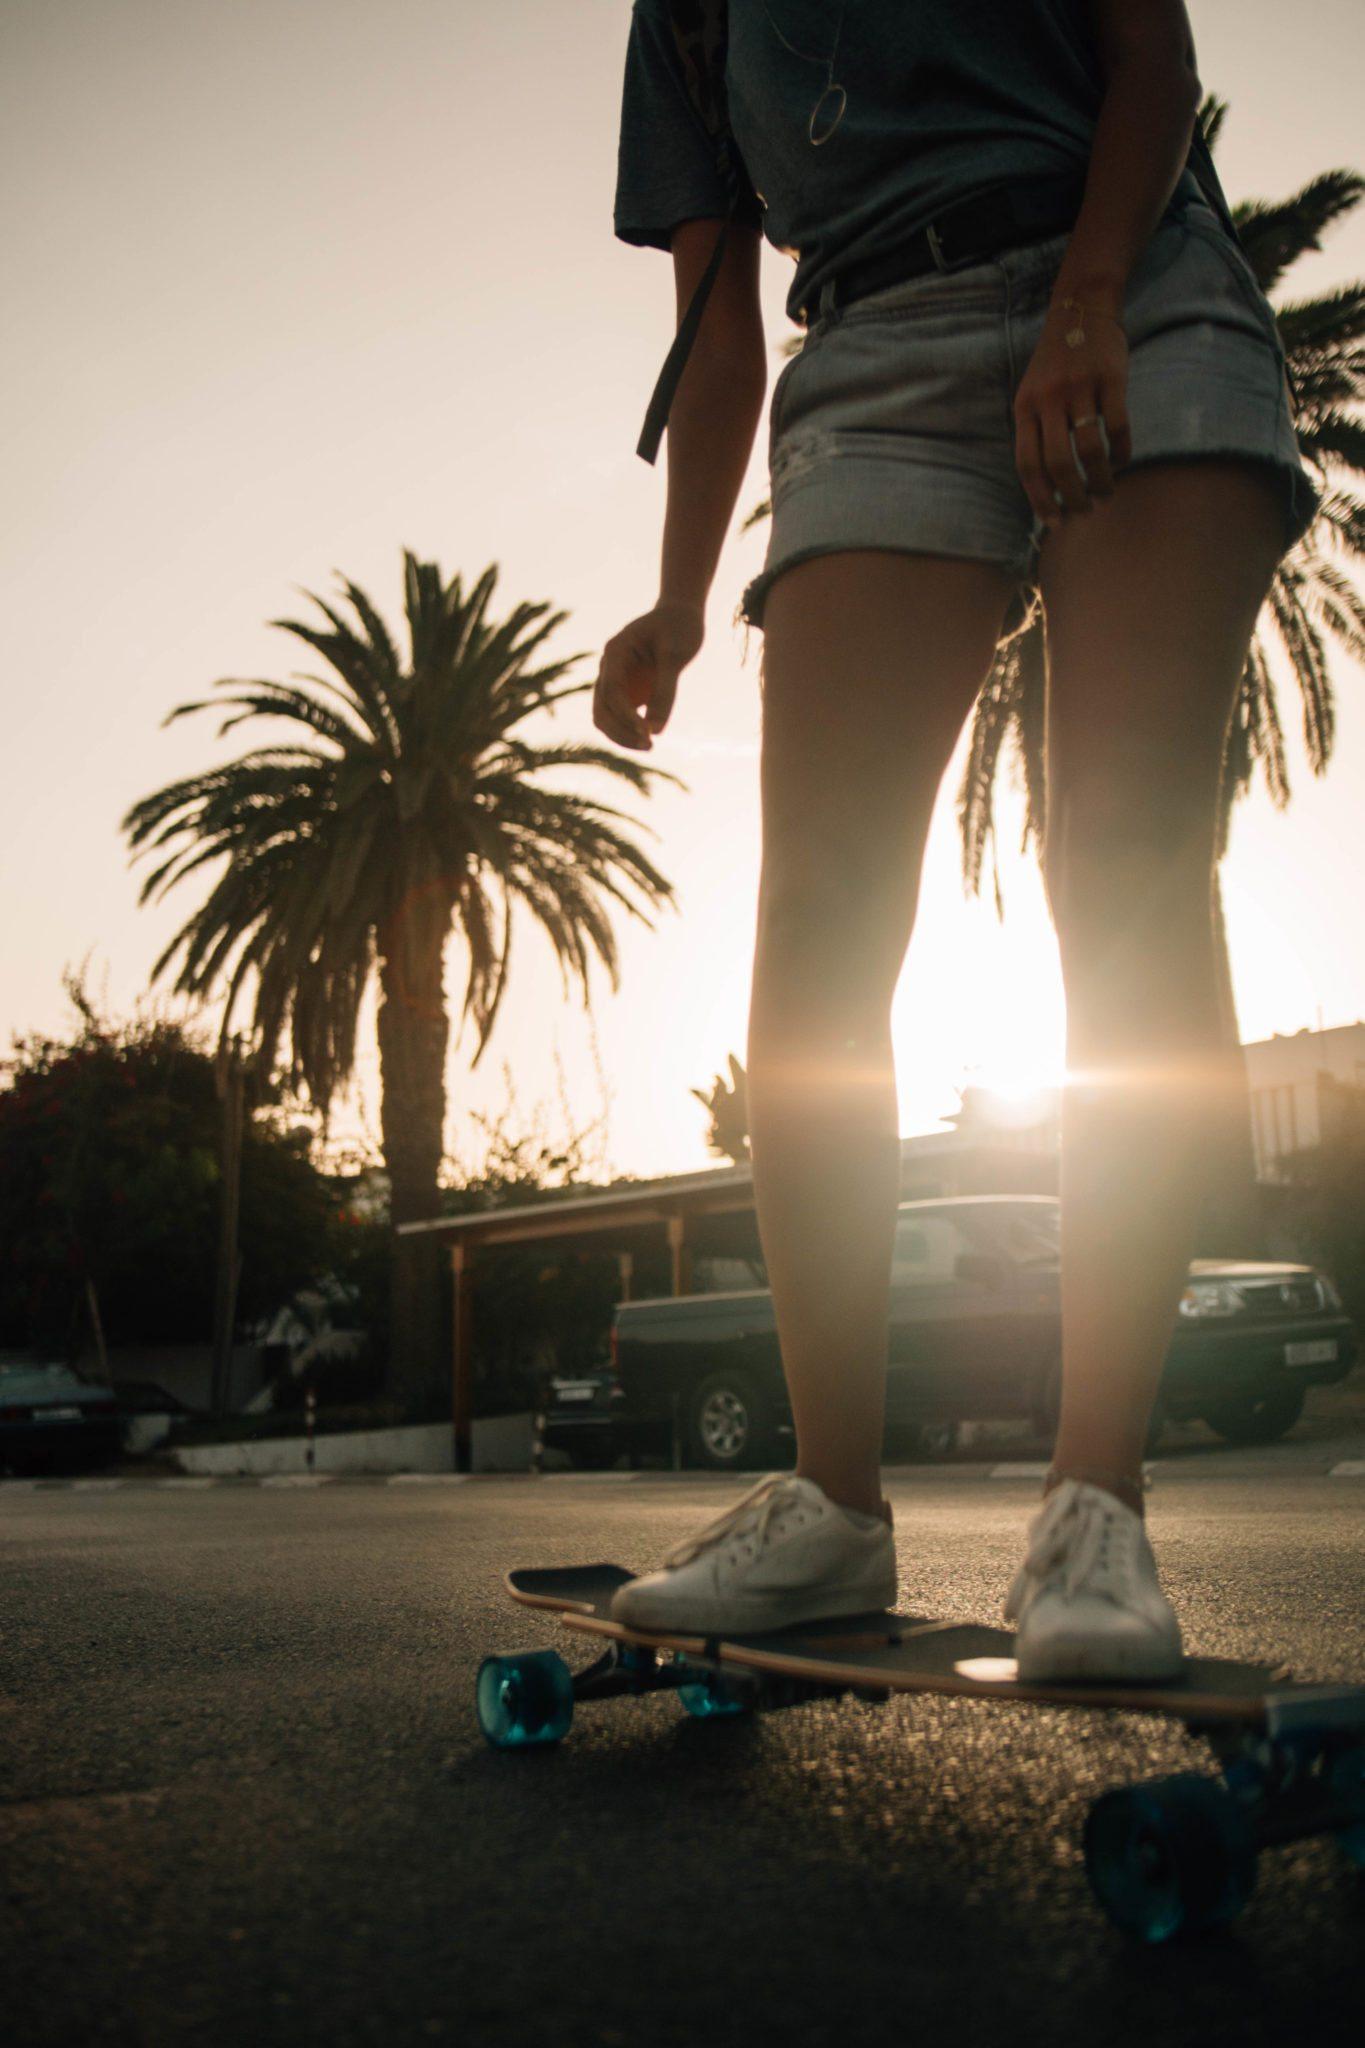 boardup-folding-skate-beach-flare-girl-justdalal-3